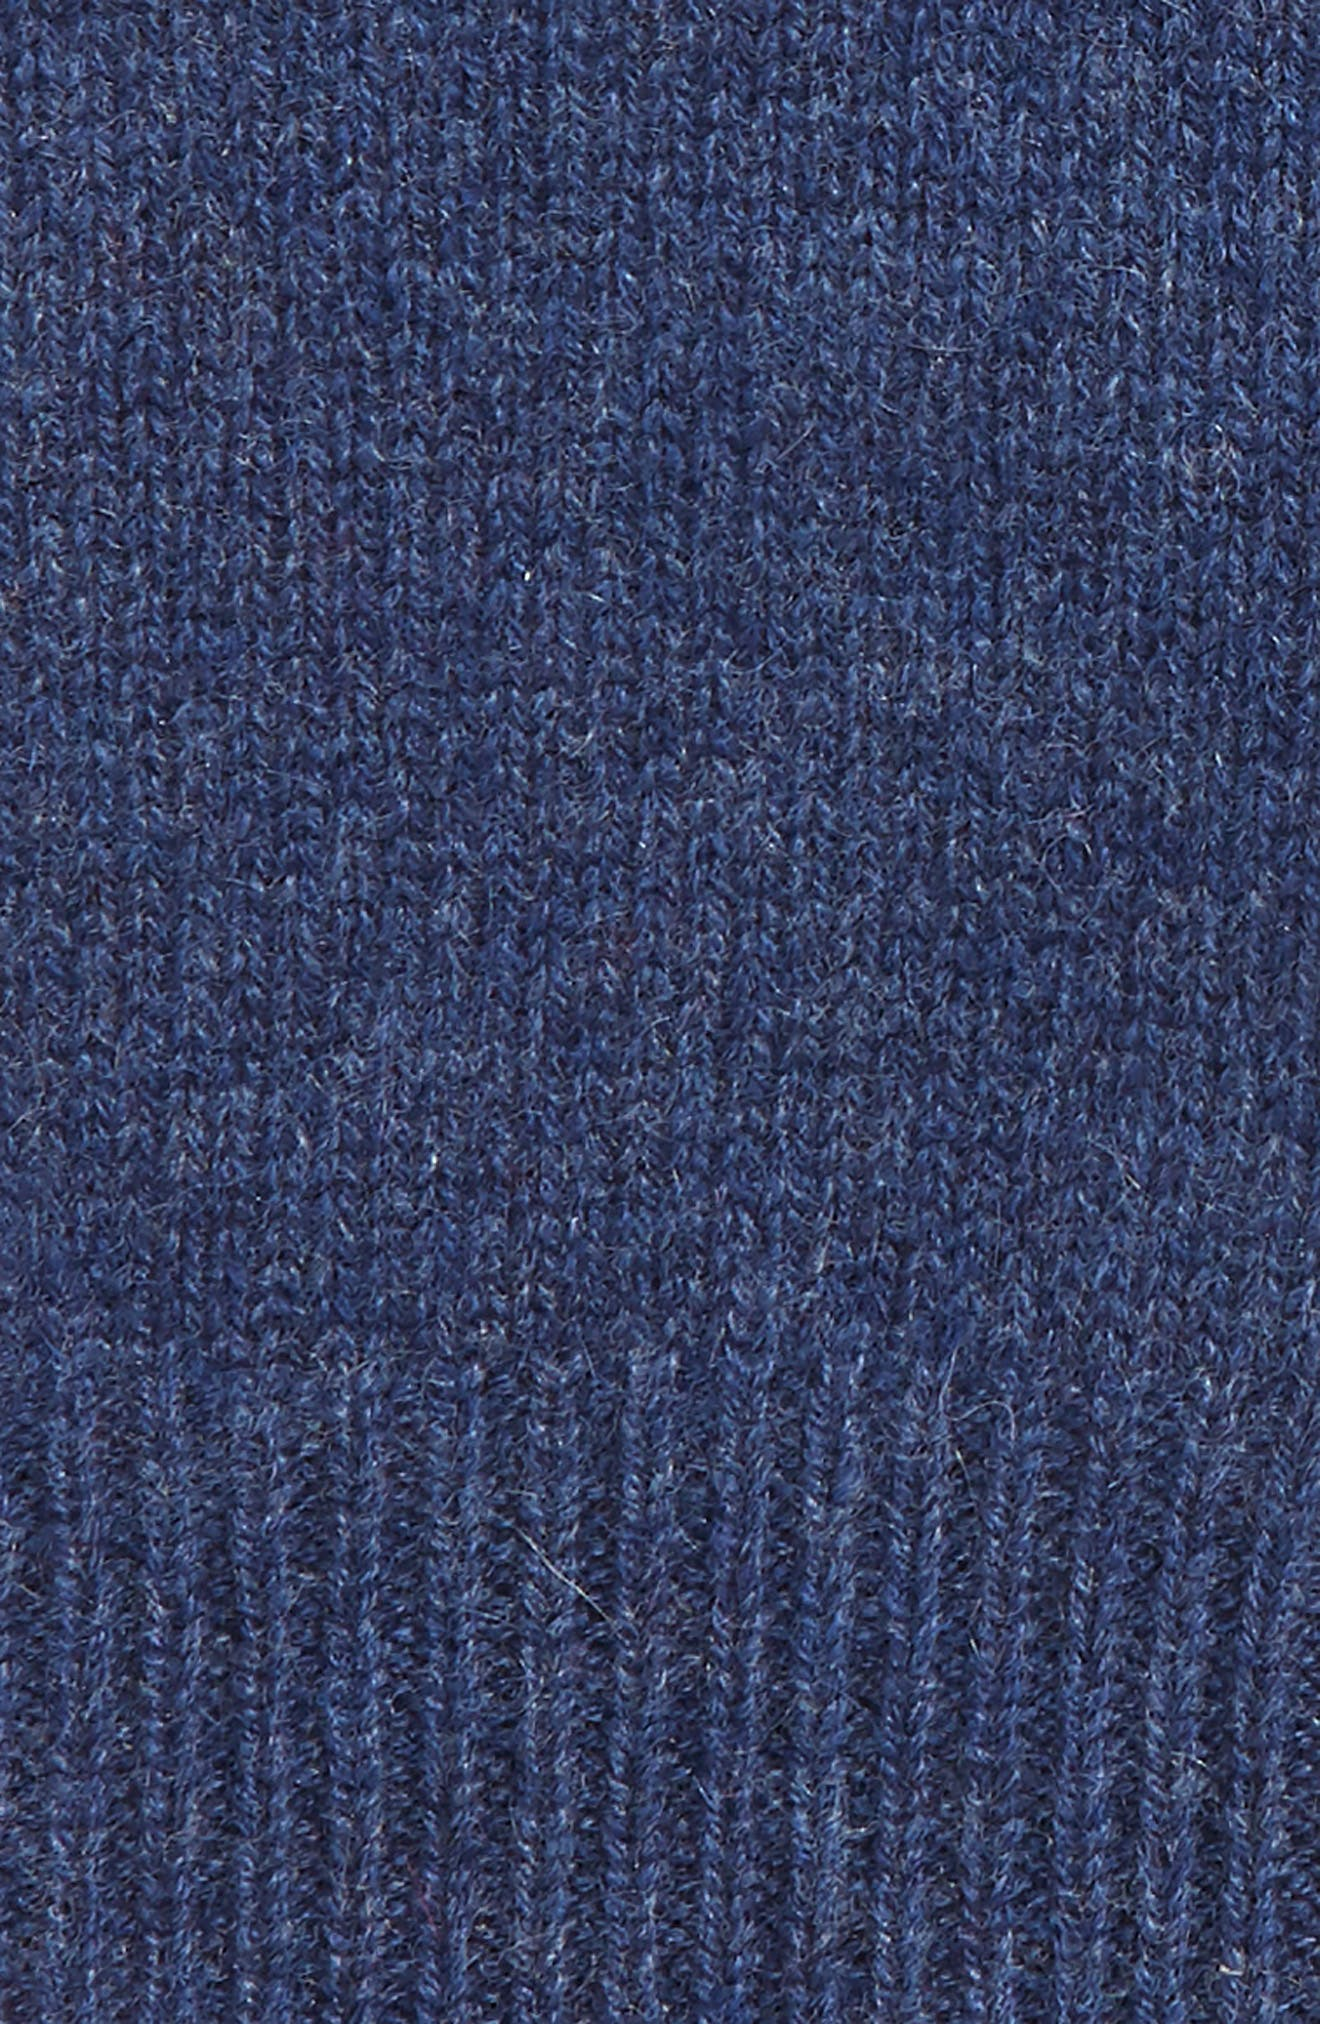 Rib Knit Cashmere Gloves,                             Alternate thumbnail 2, color,                             BLUE CAPTAIN HEATHER